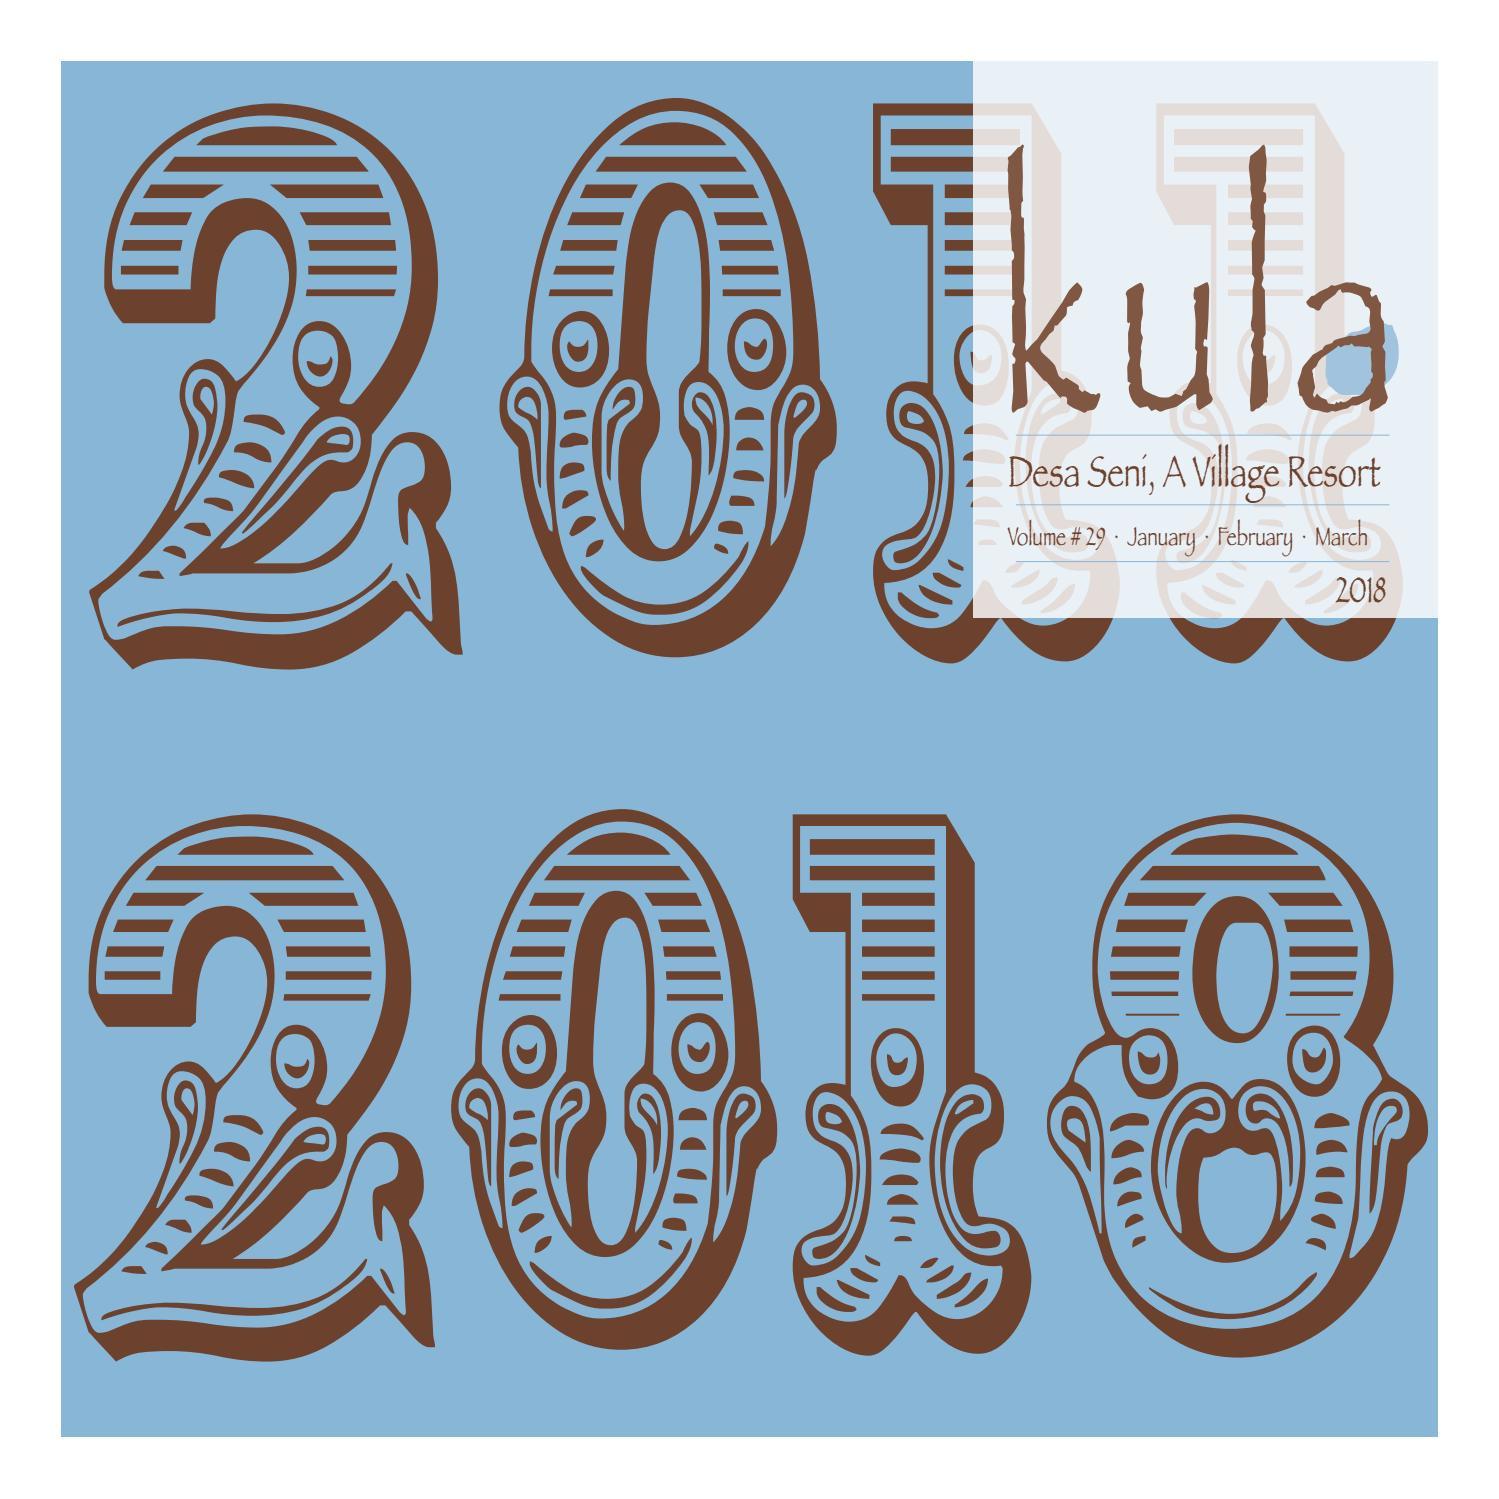 Kula Magazine Issue #29 by Desa Seni, A Village Resort - issuu